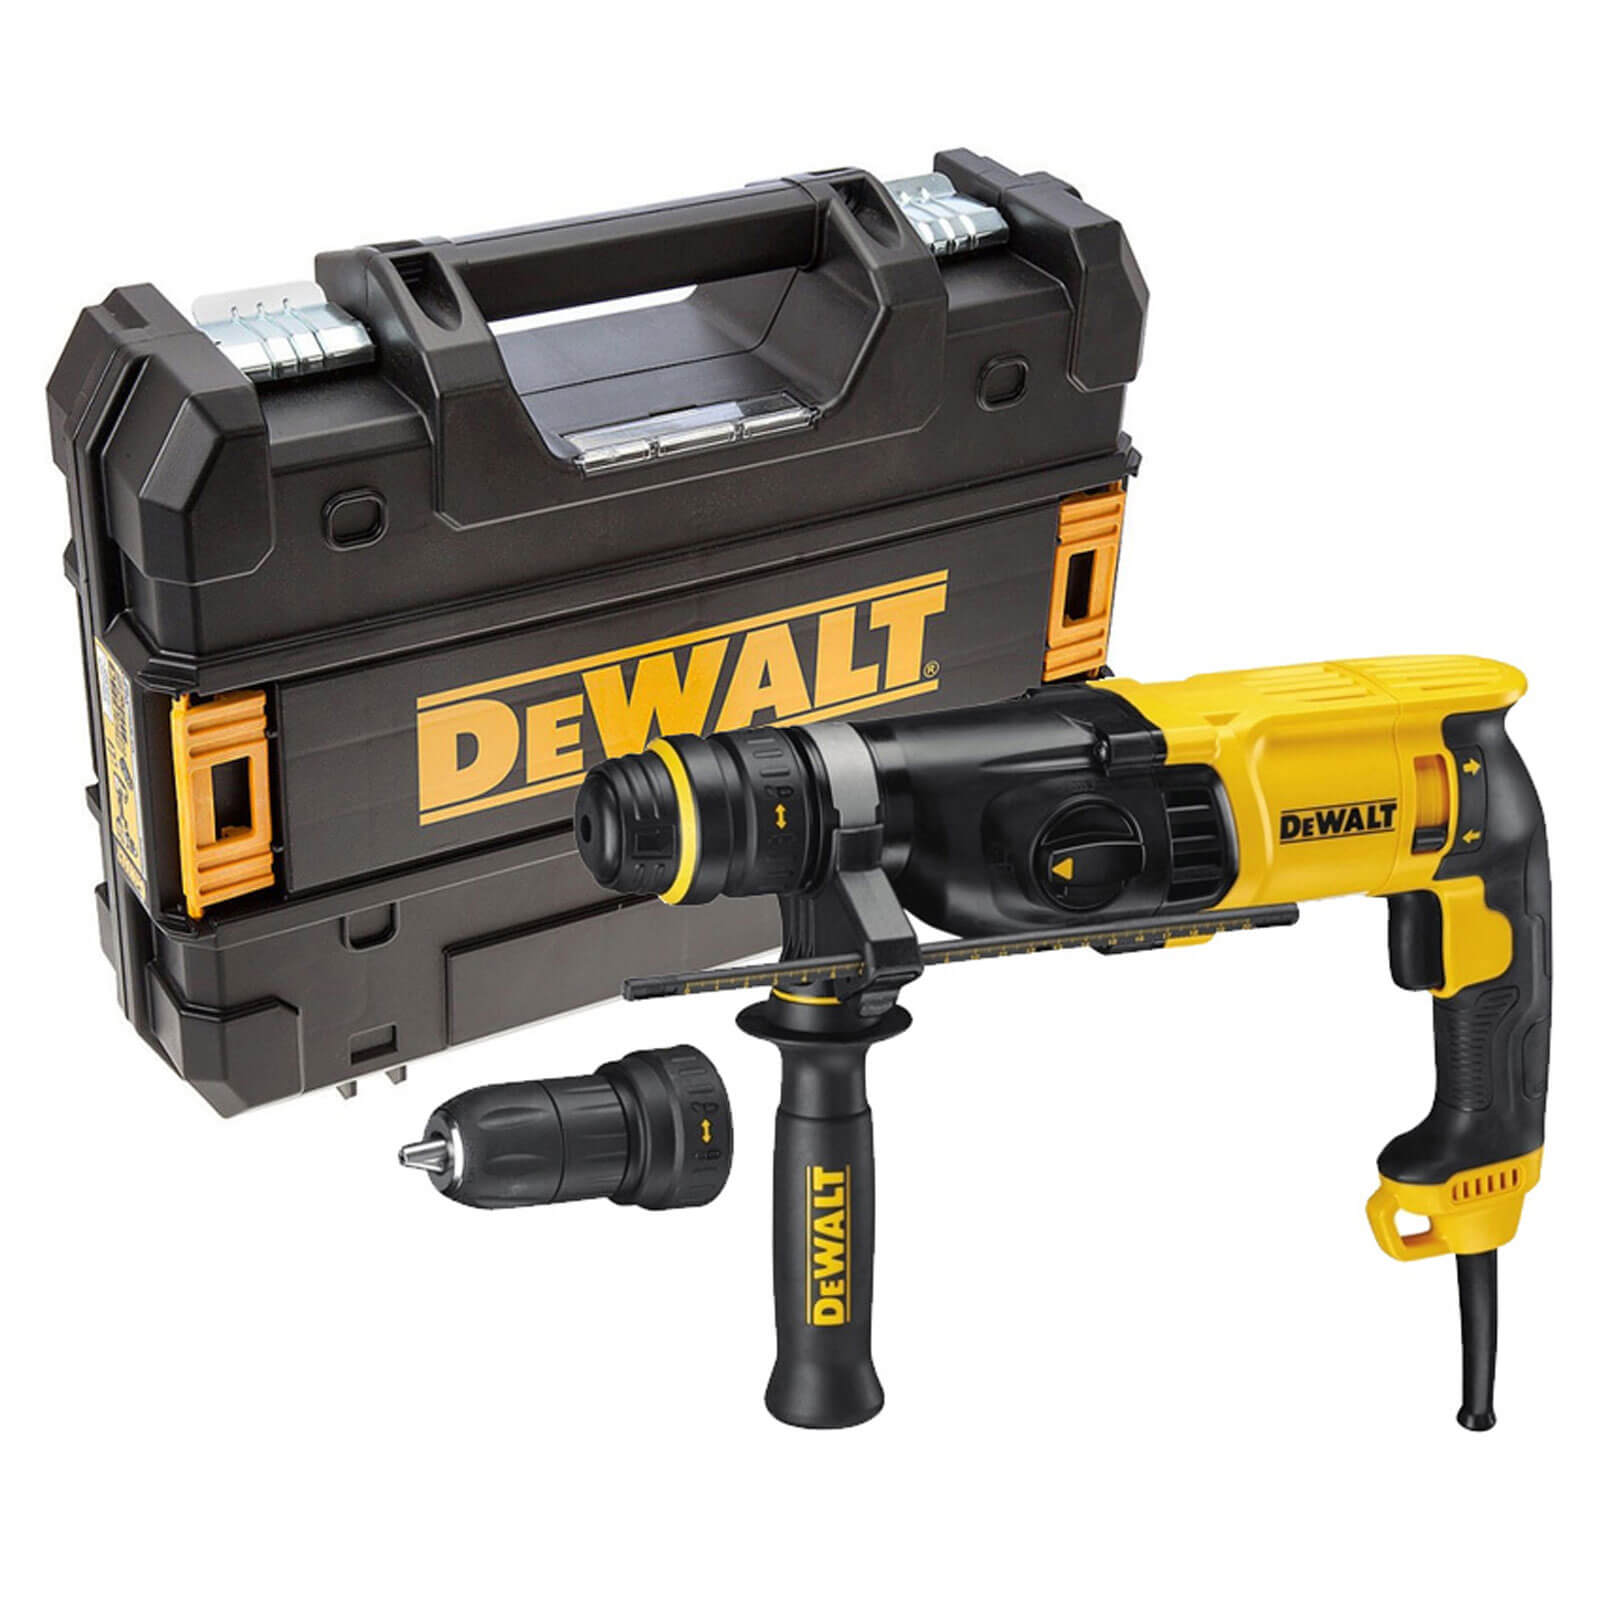 Image of DeWalt D25134K SDS Plus Hammer Drill 3 Mode 800w with Quick Change Chuck 110v